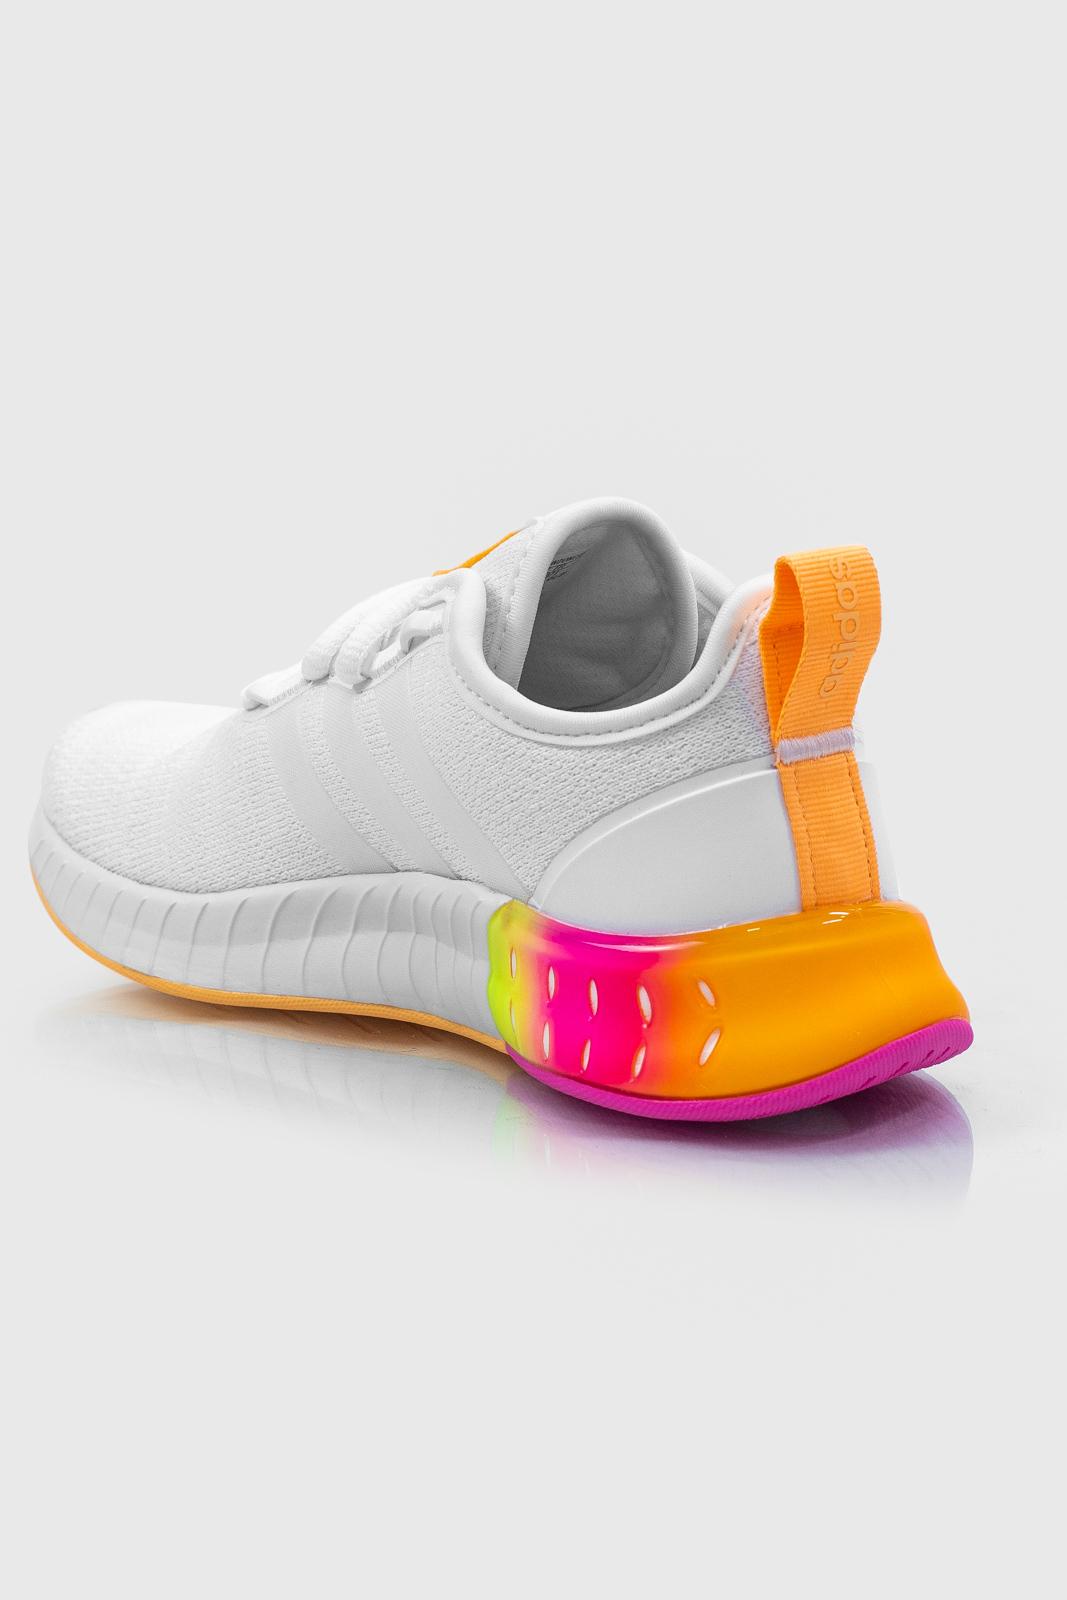 Tenis Running Adidas Kaptir Super